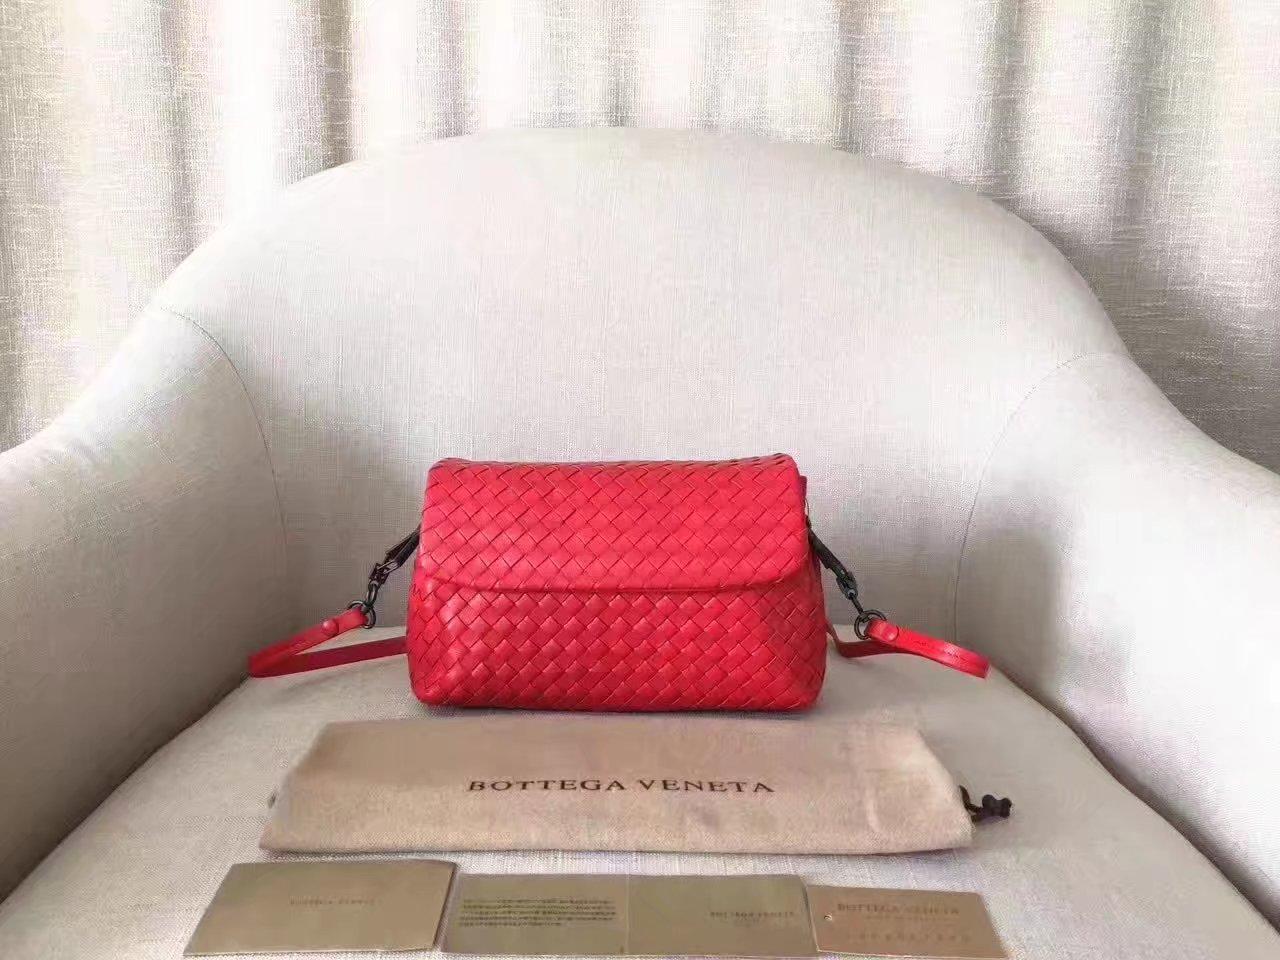 Bottega Veneta Baby Olimpia Bag in Glicine Intrecciato Nappa Leather Red